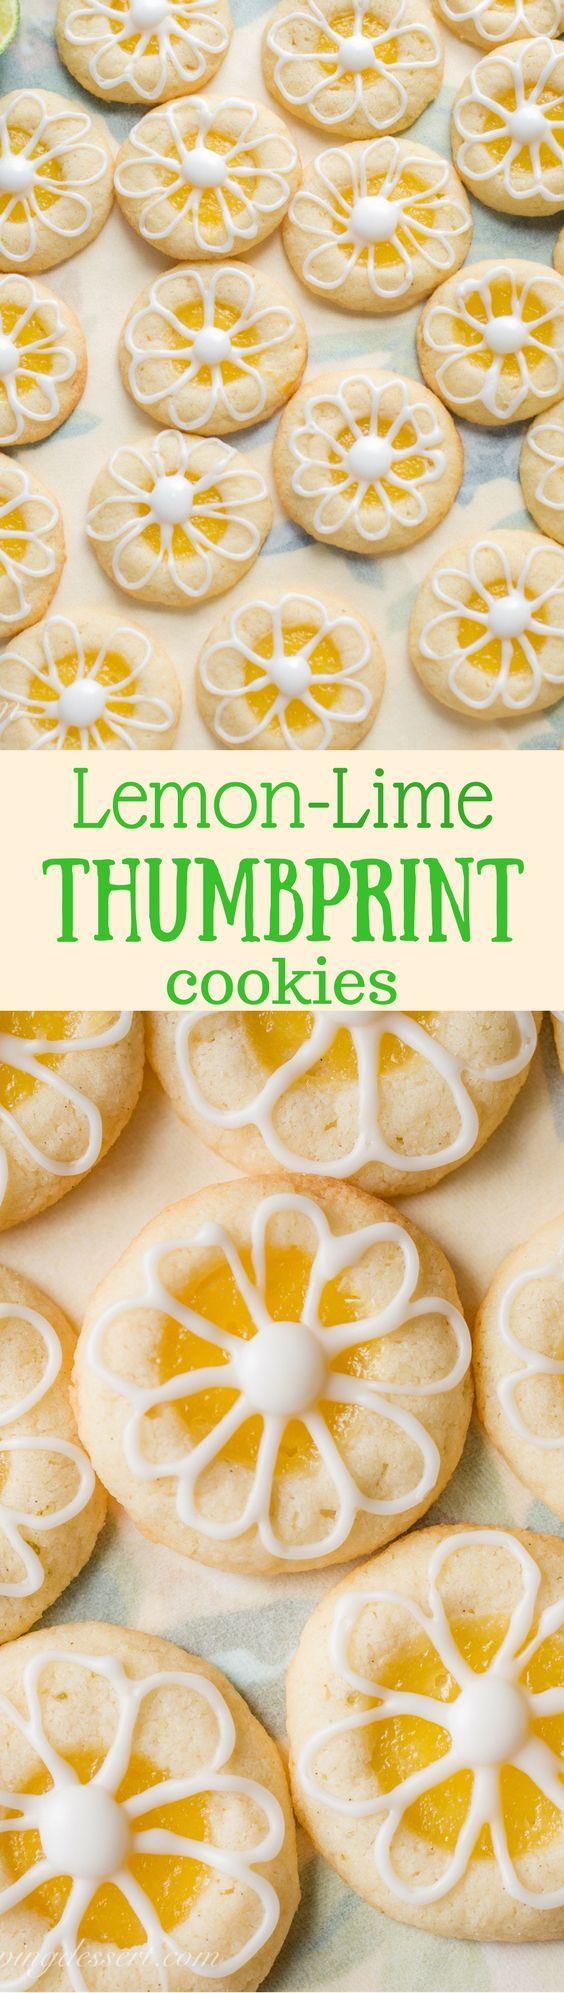 Lemon-Lime Shortbread